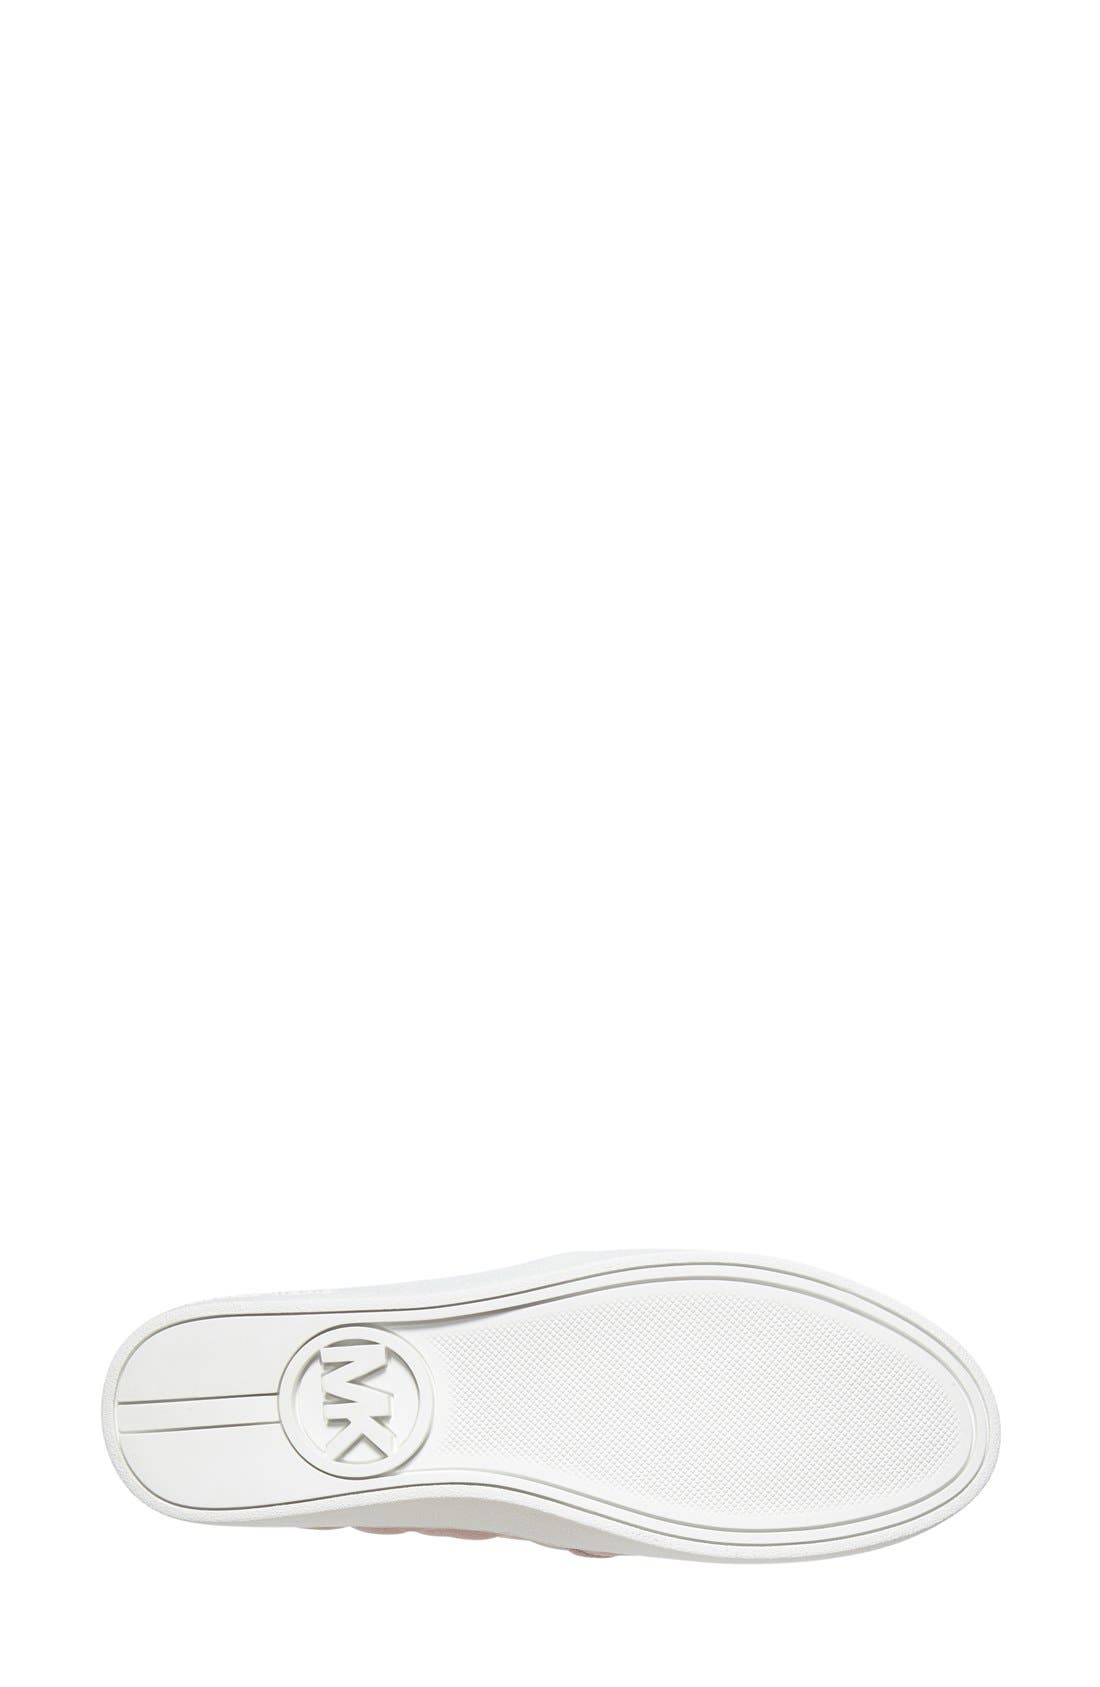 Keaton Slip-On Sneaker,                             Alternate thumbnail 230, color,